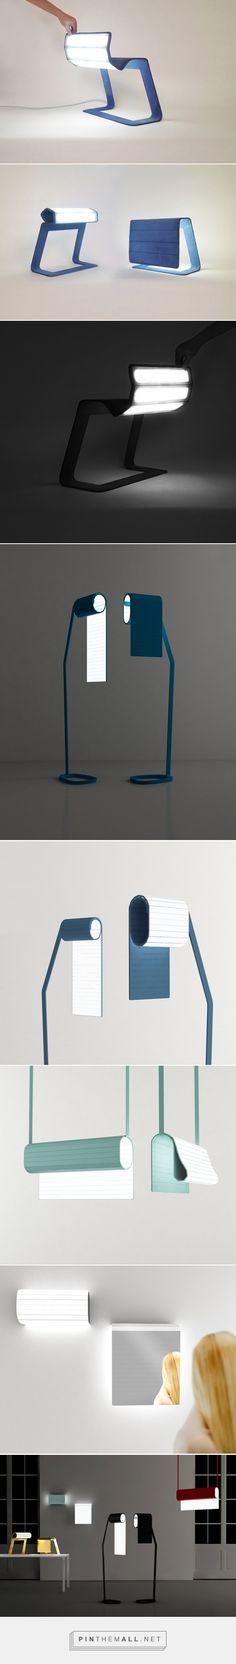 bina baitels OLED recto-verso lamp collection at milan design week 2015 - created via http://pinthemall.net